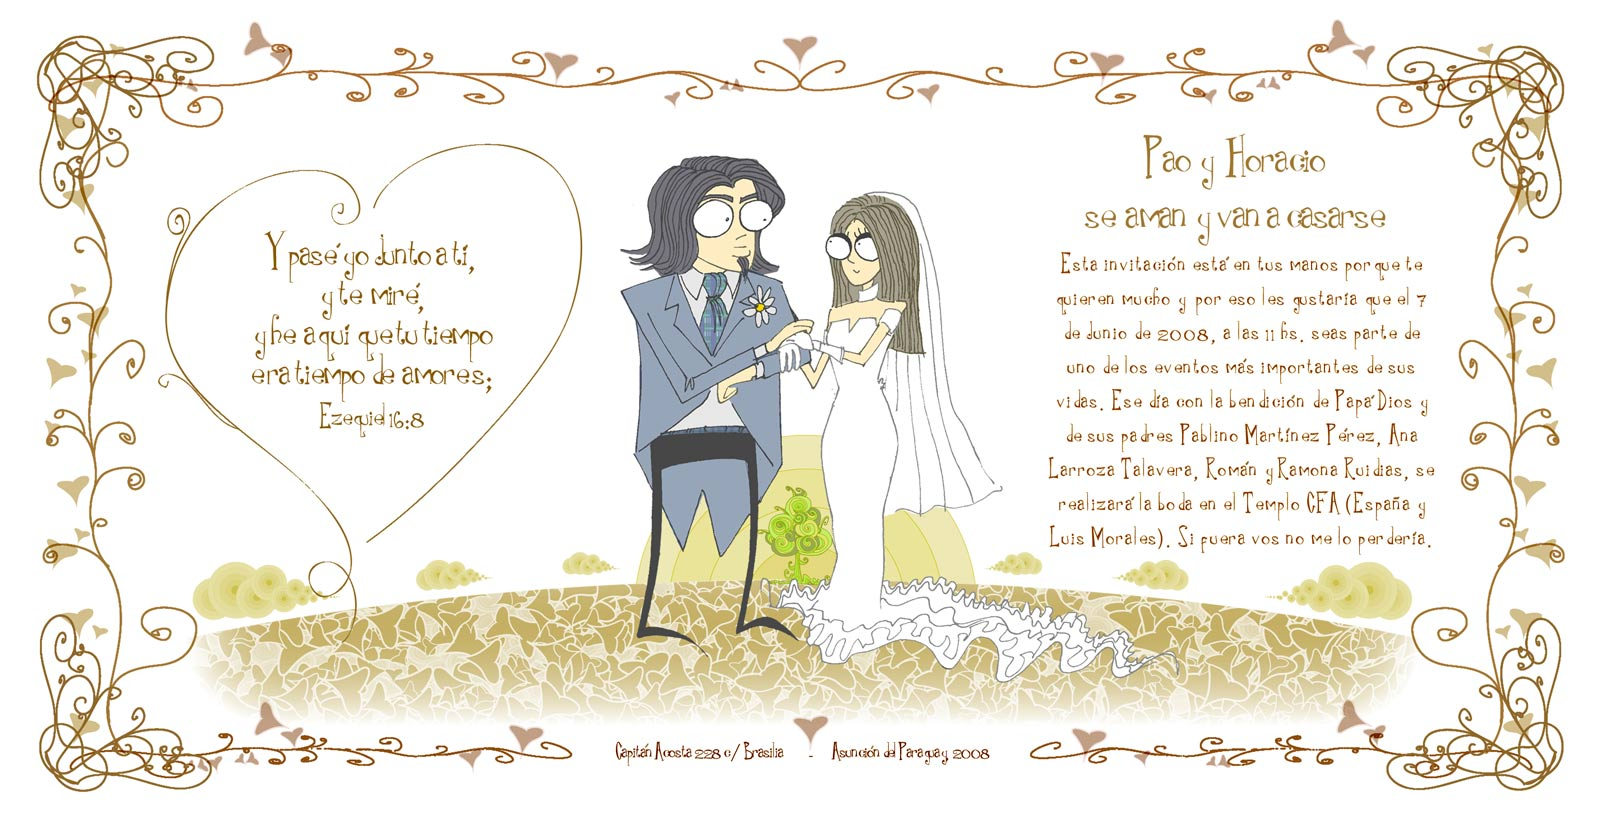 Tarjetas De Aniversario De Bodas: Tarjetas De Felicitacion Aniversario De Bodas Gratis